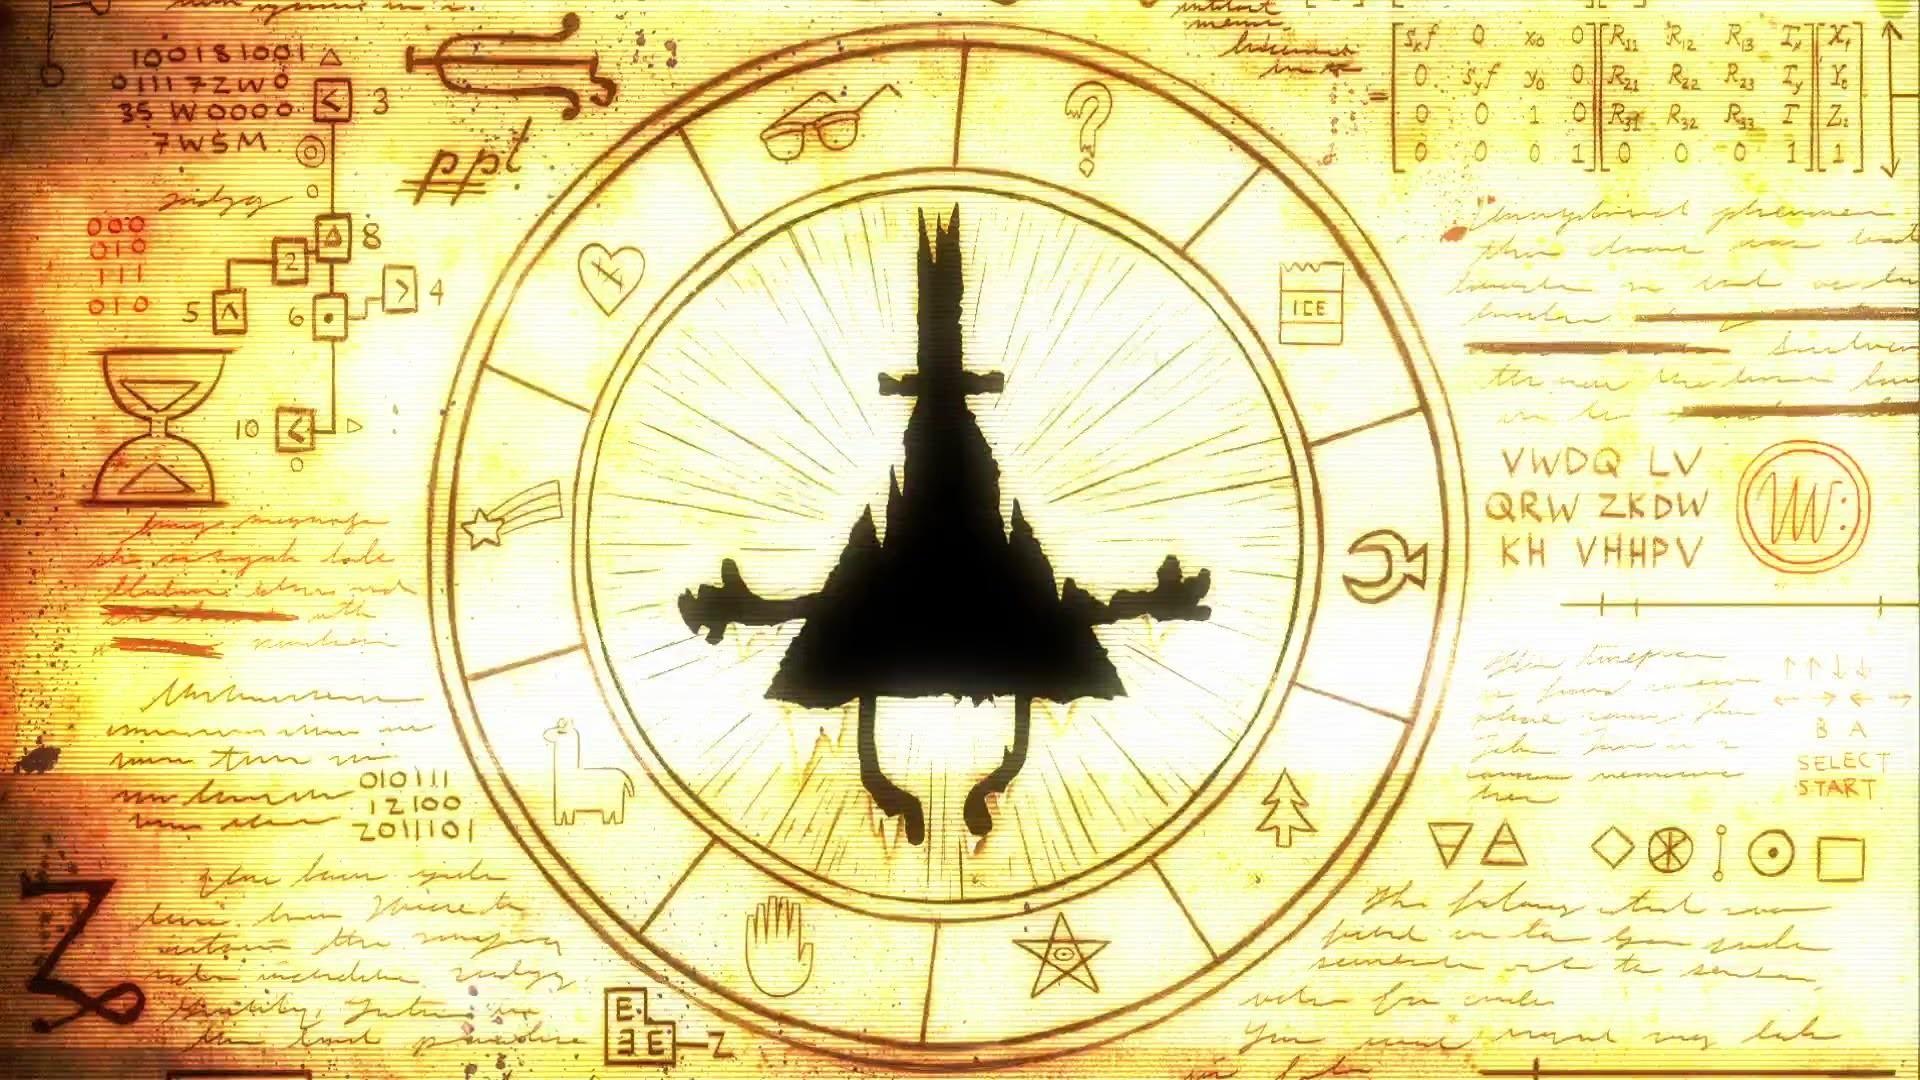 Gravity Falls Hd Wallpaper Bill Cipher Wallpapers 183 ①